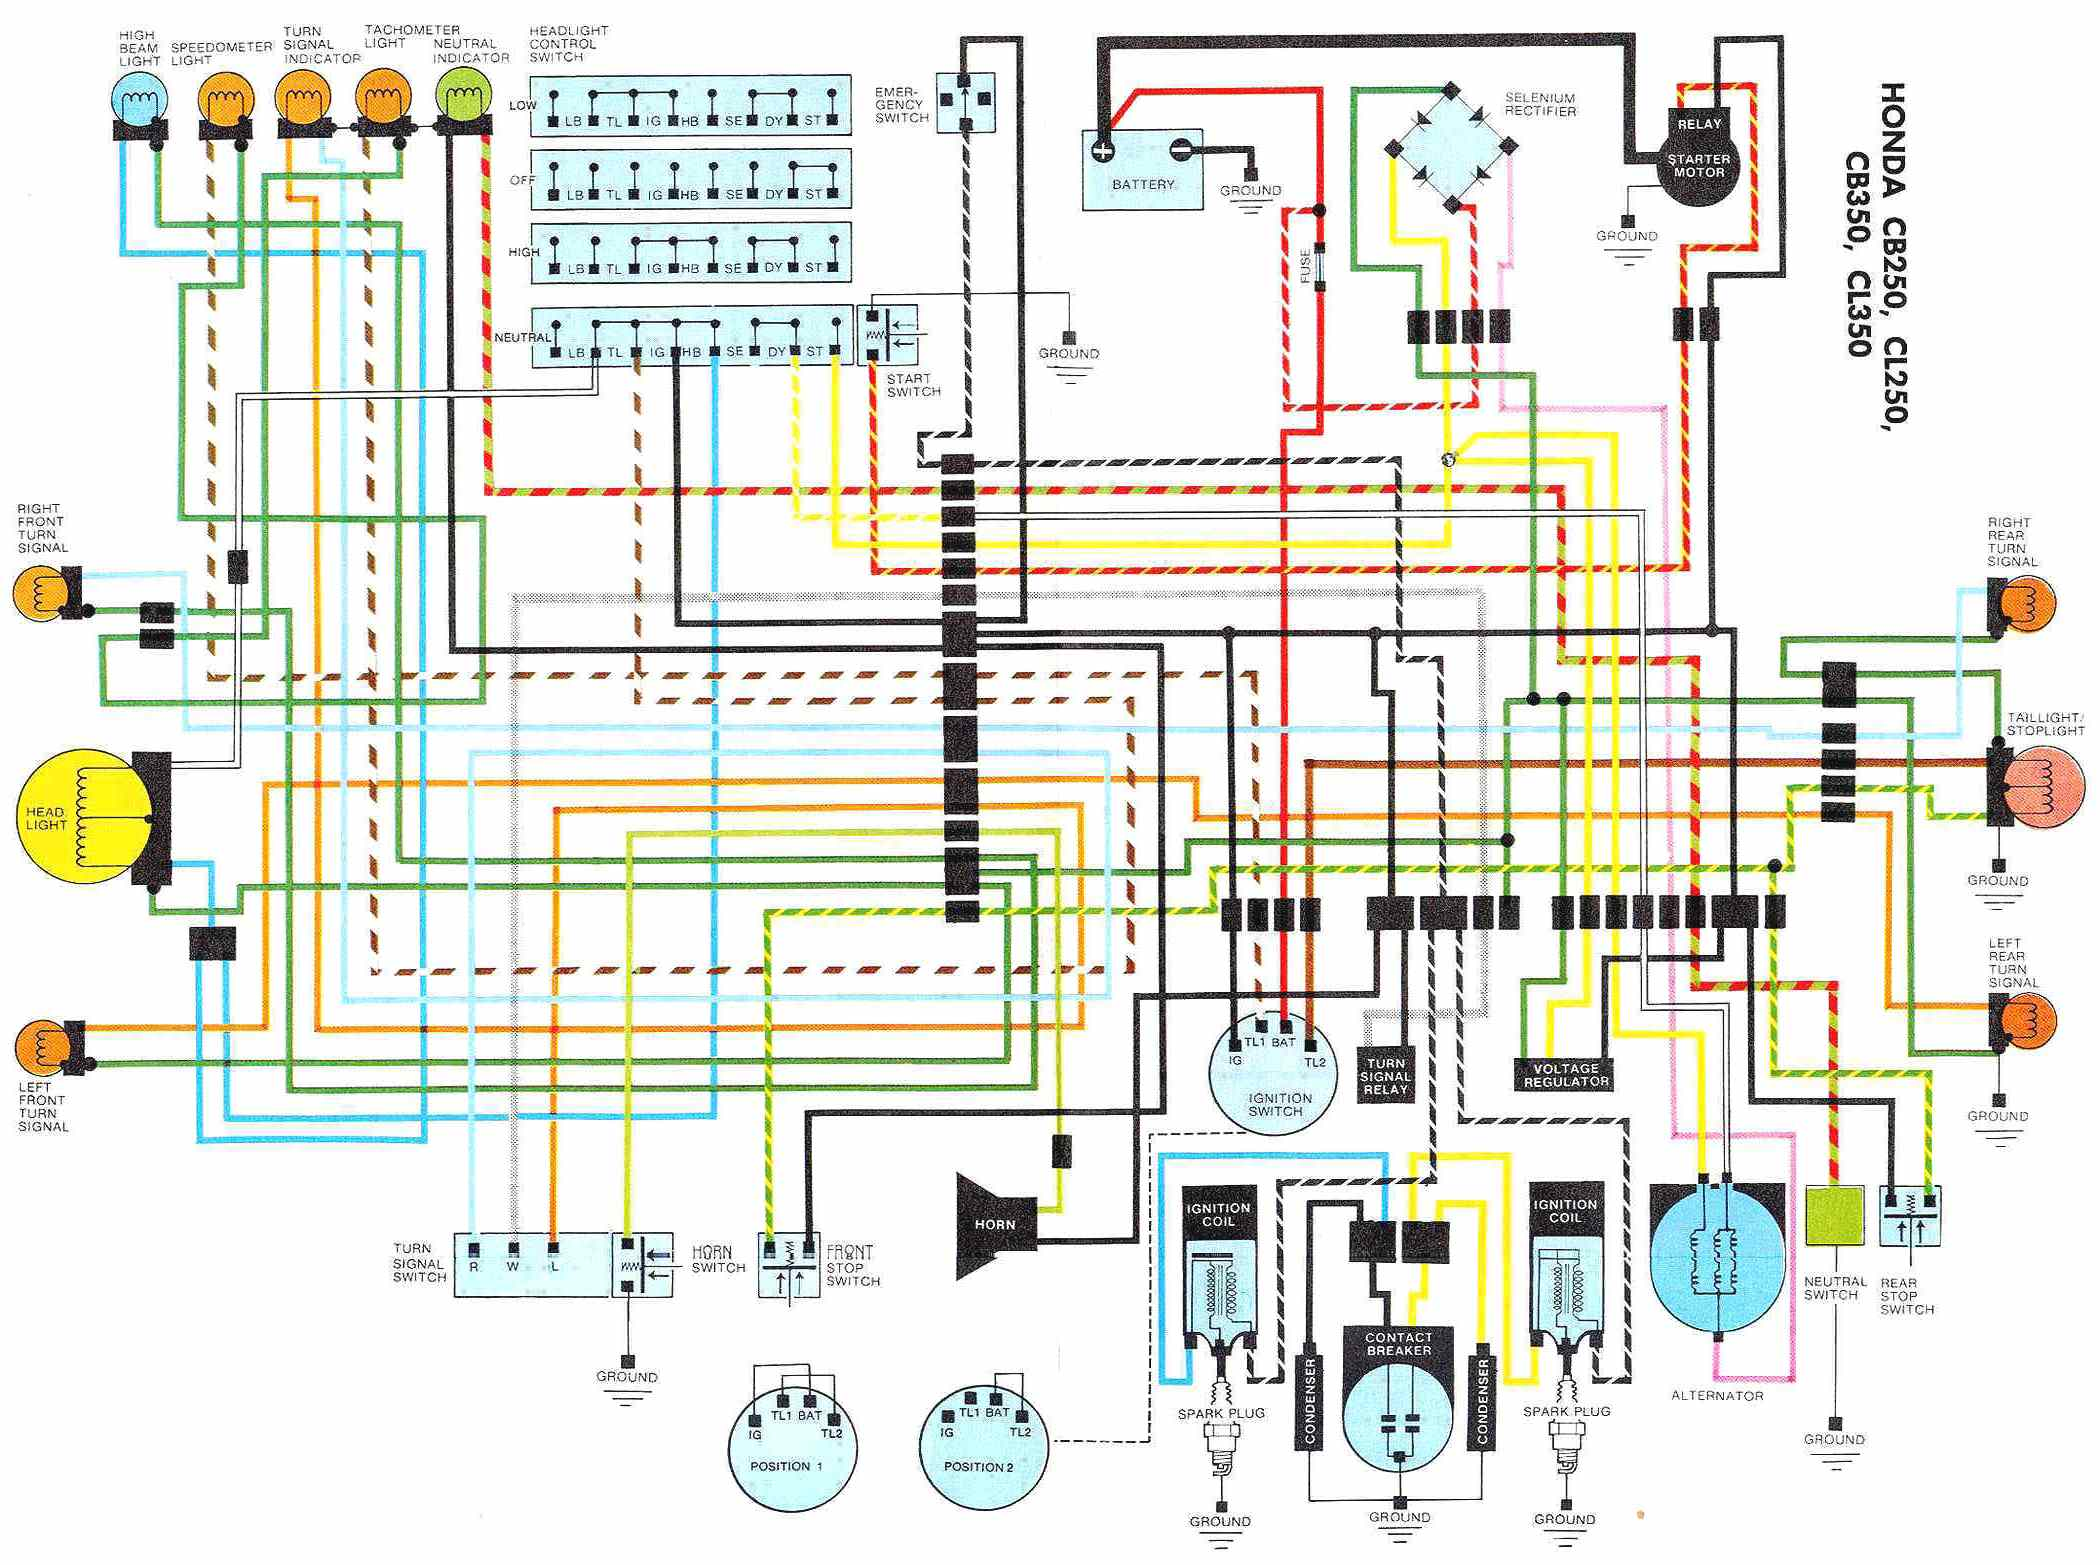 1970 honda sl350 help page 2 rh hondatwins net 1971 honda sl350 wiring diagram